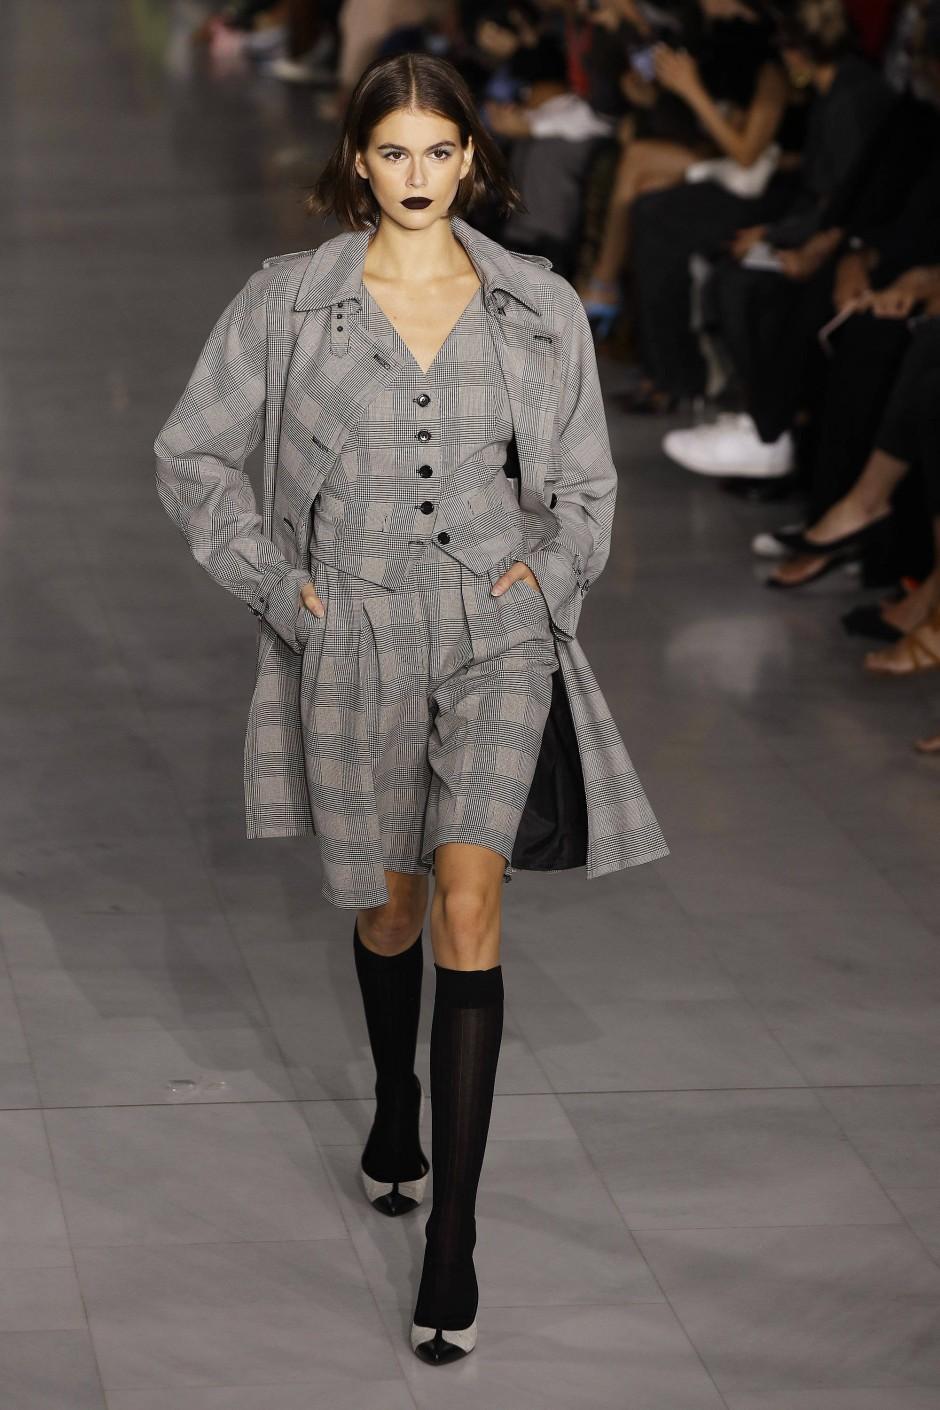 Model Kaja Gerber präsentierte 2019 die diesjährige Frühjahrskollektion für Max Mara: viel Grau dabei.